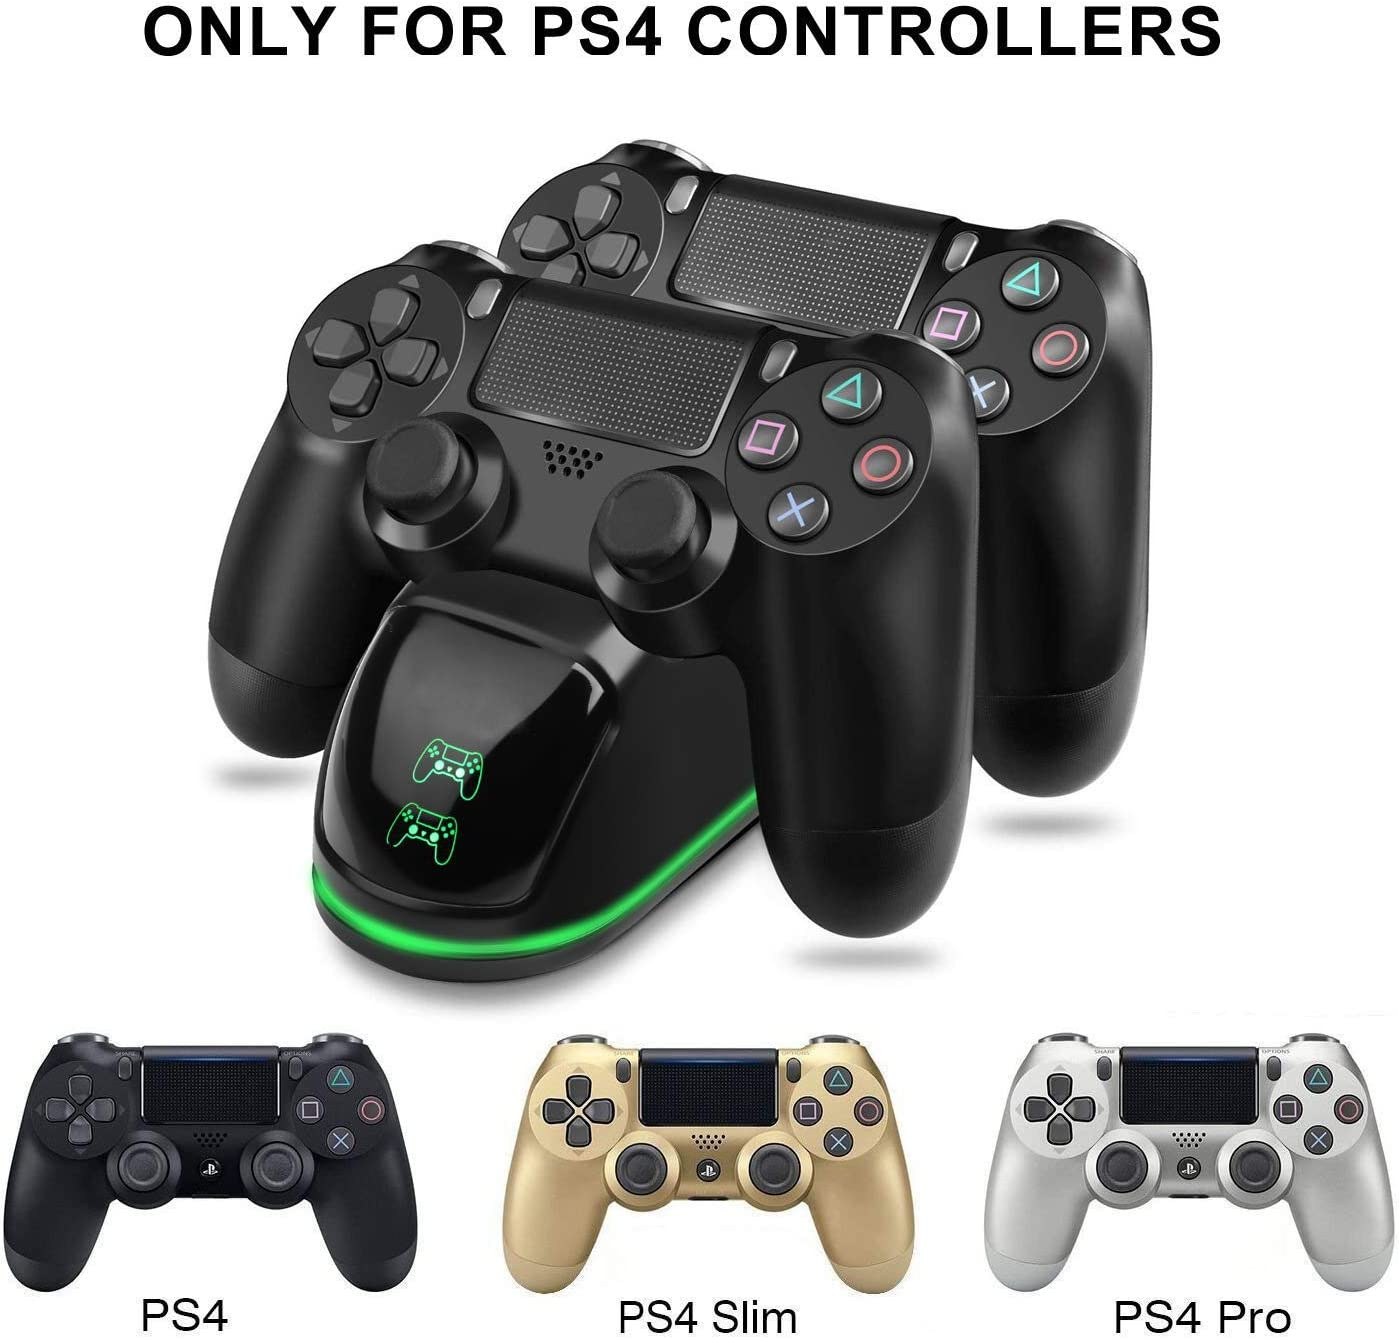 Amazon.com: Cargador controlador TGJOR PS4 – DualShock 4 PS4 ...